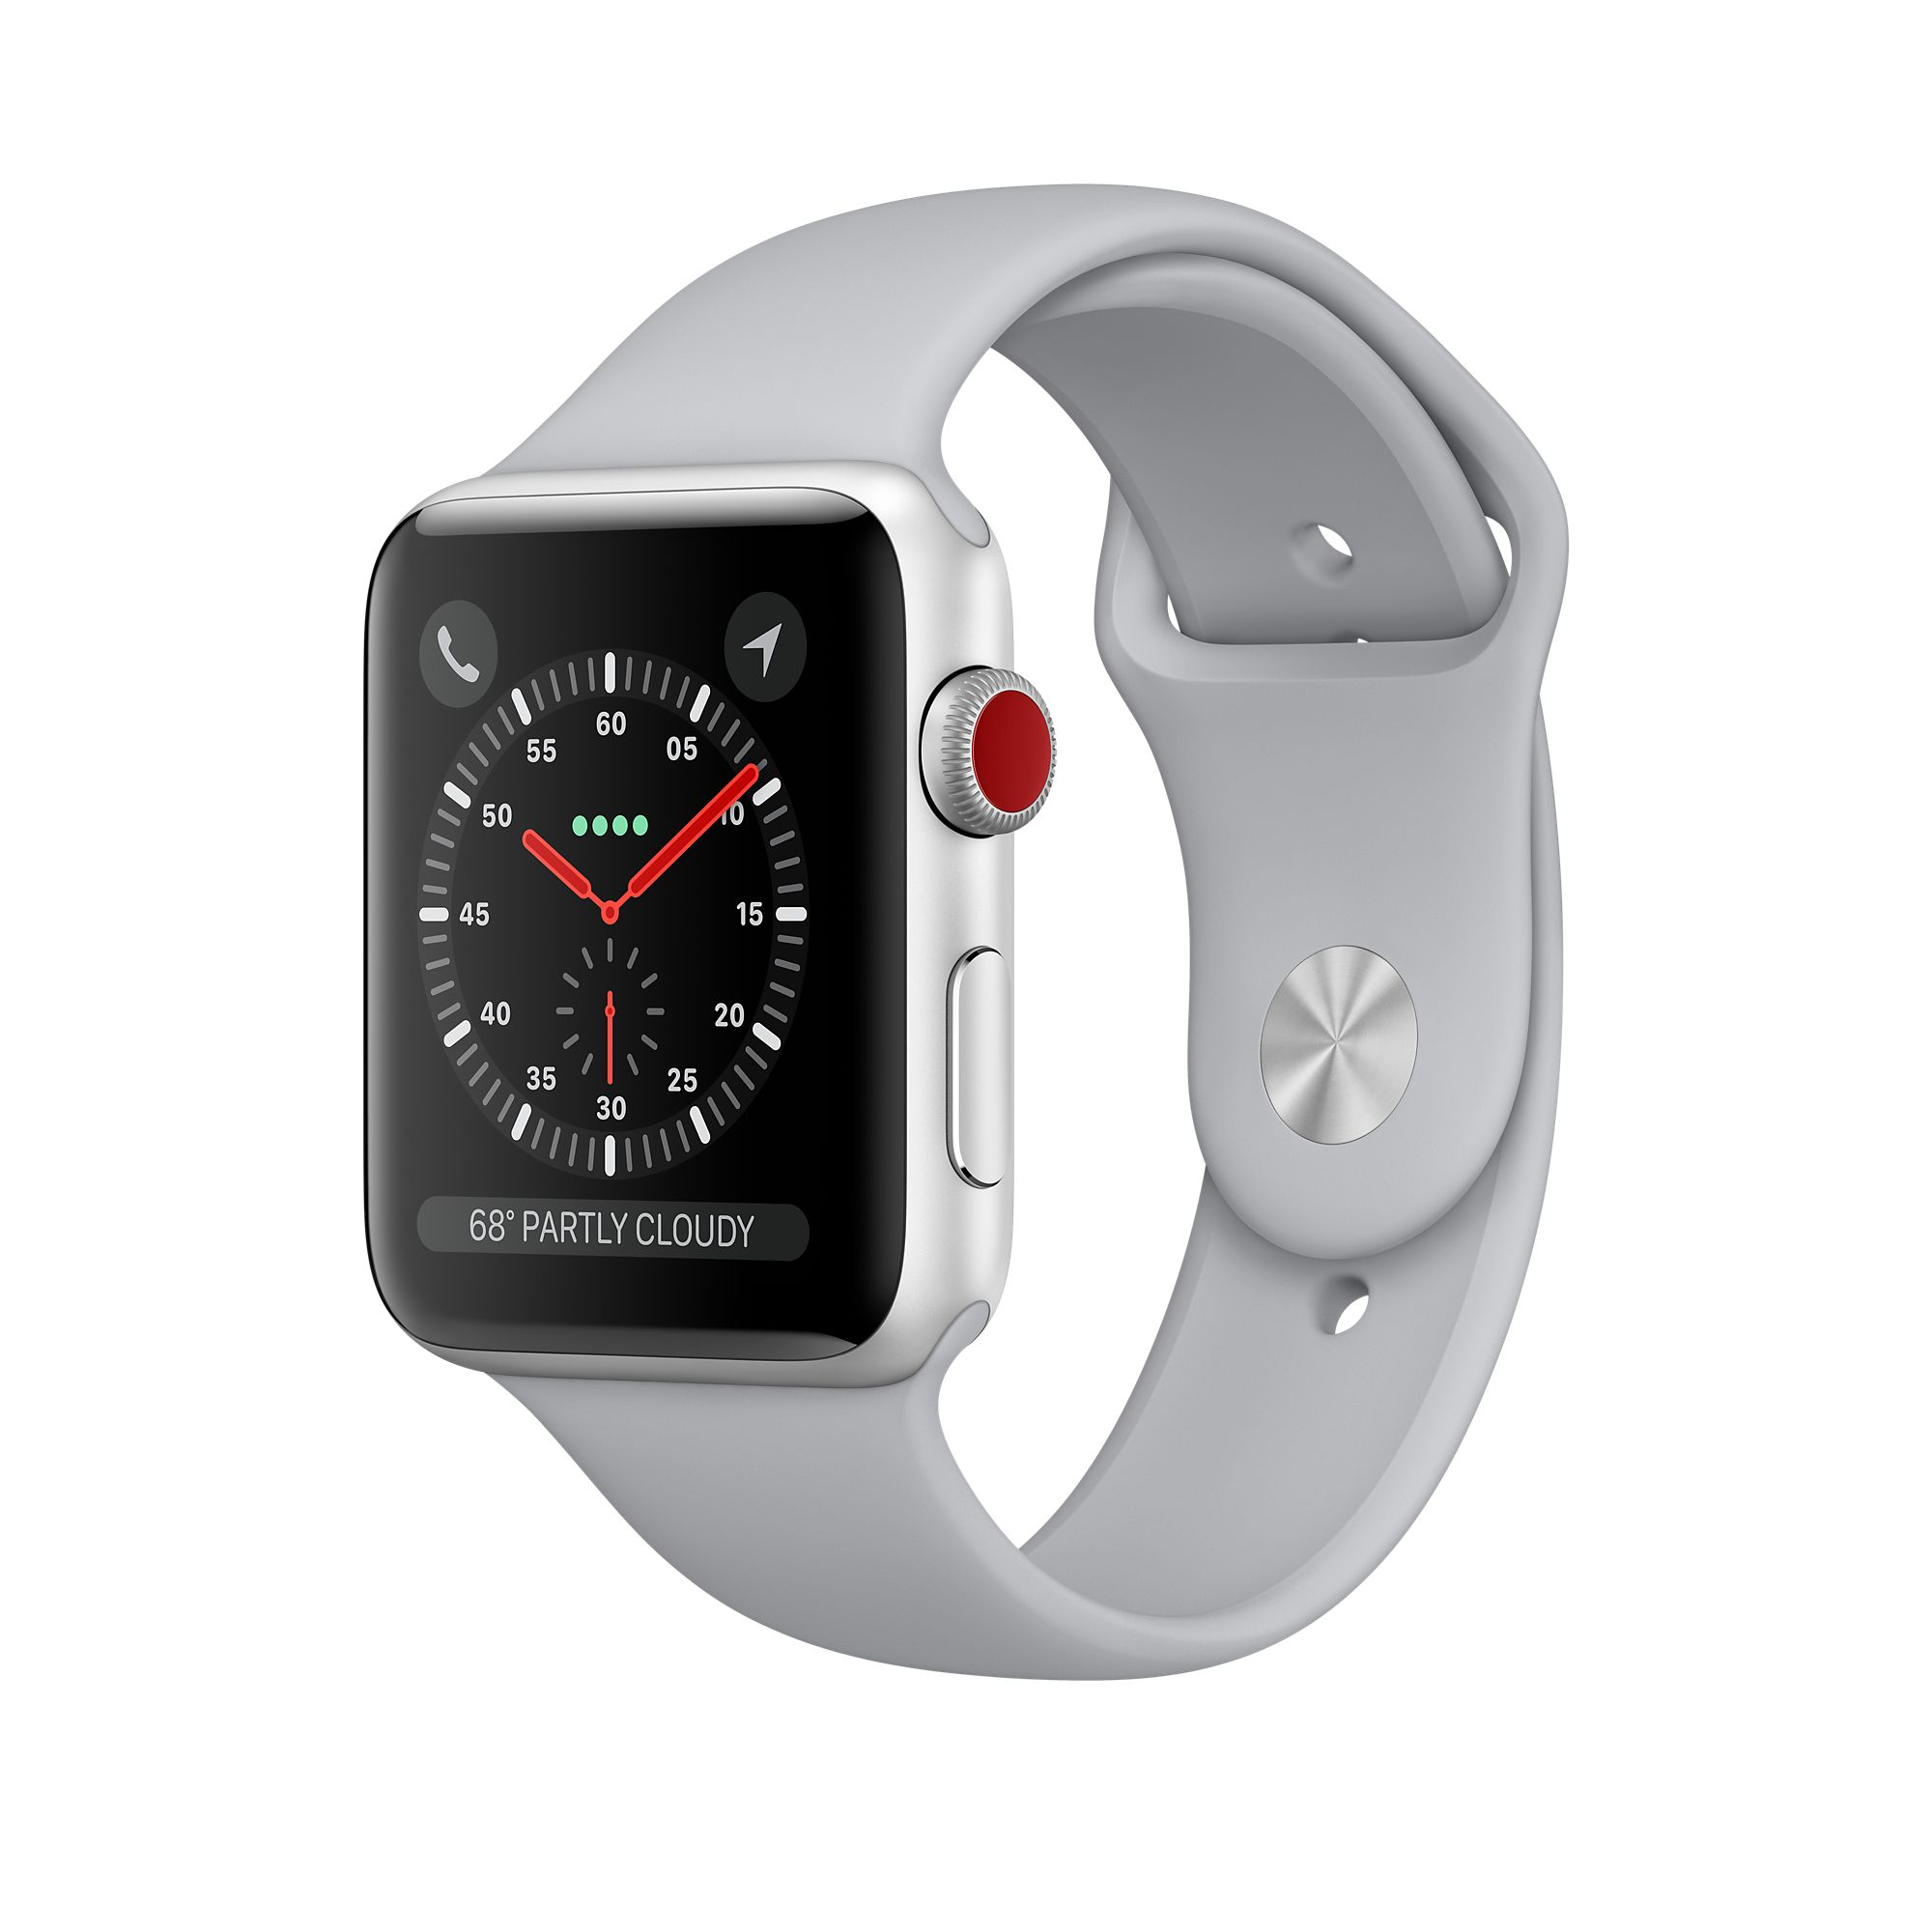 Apple Watch 3 imagem 2.jpeg